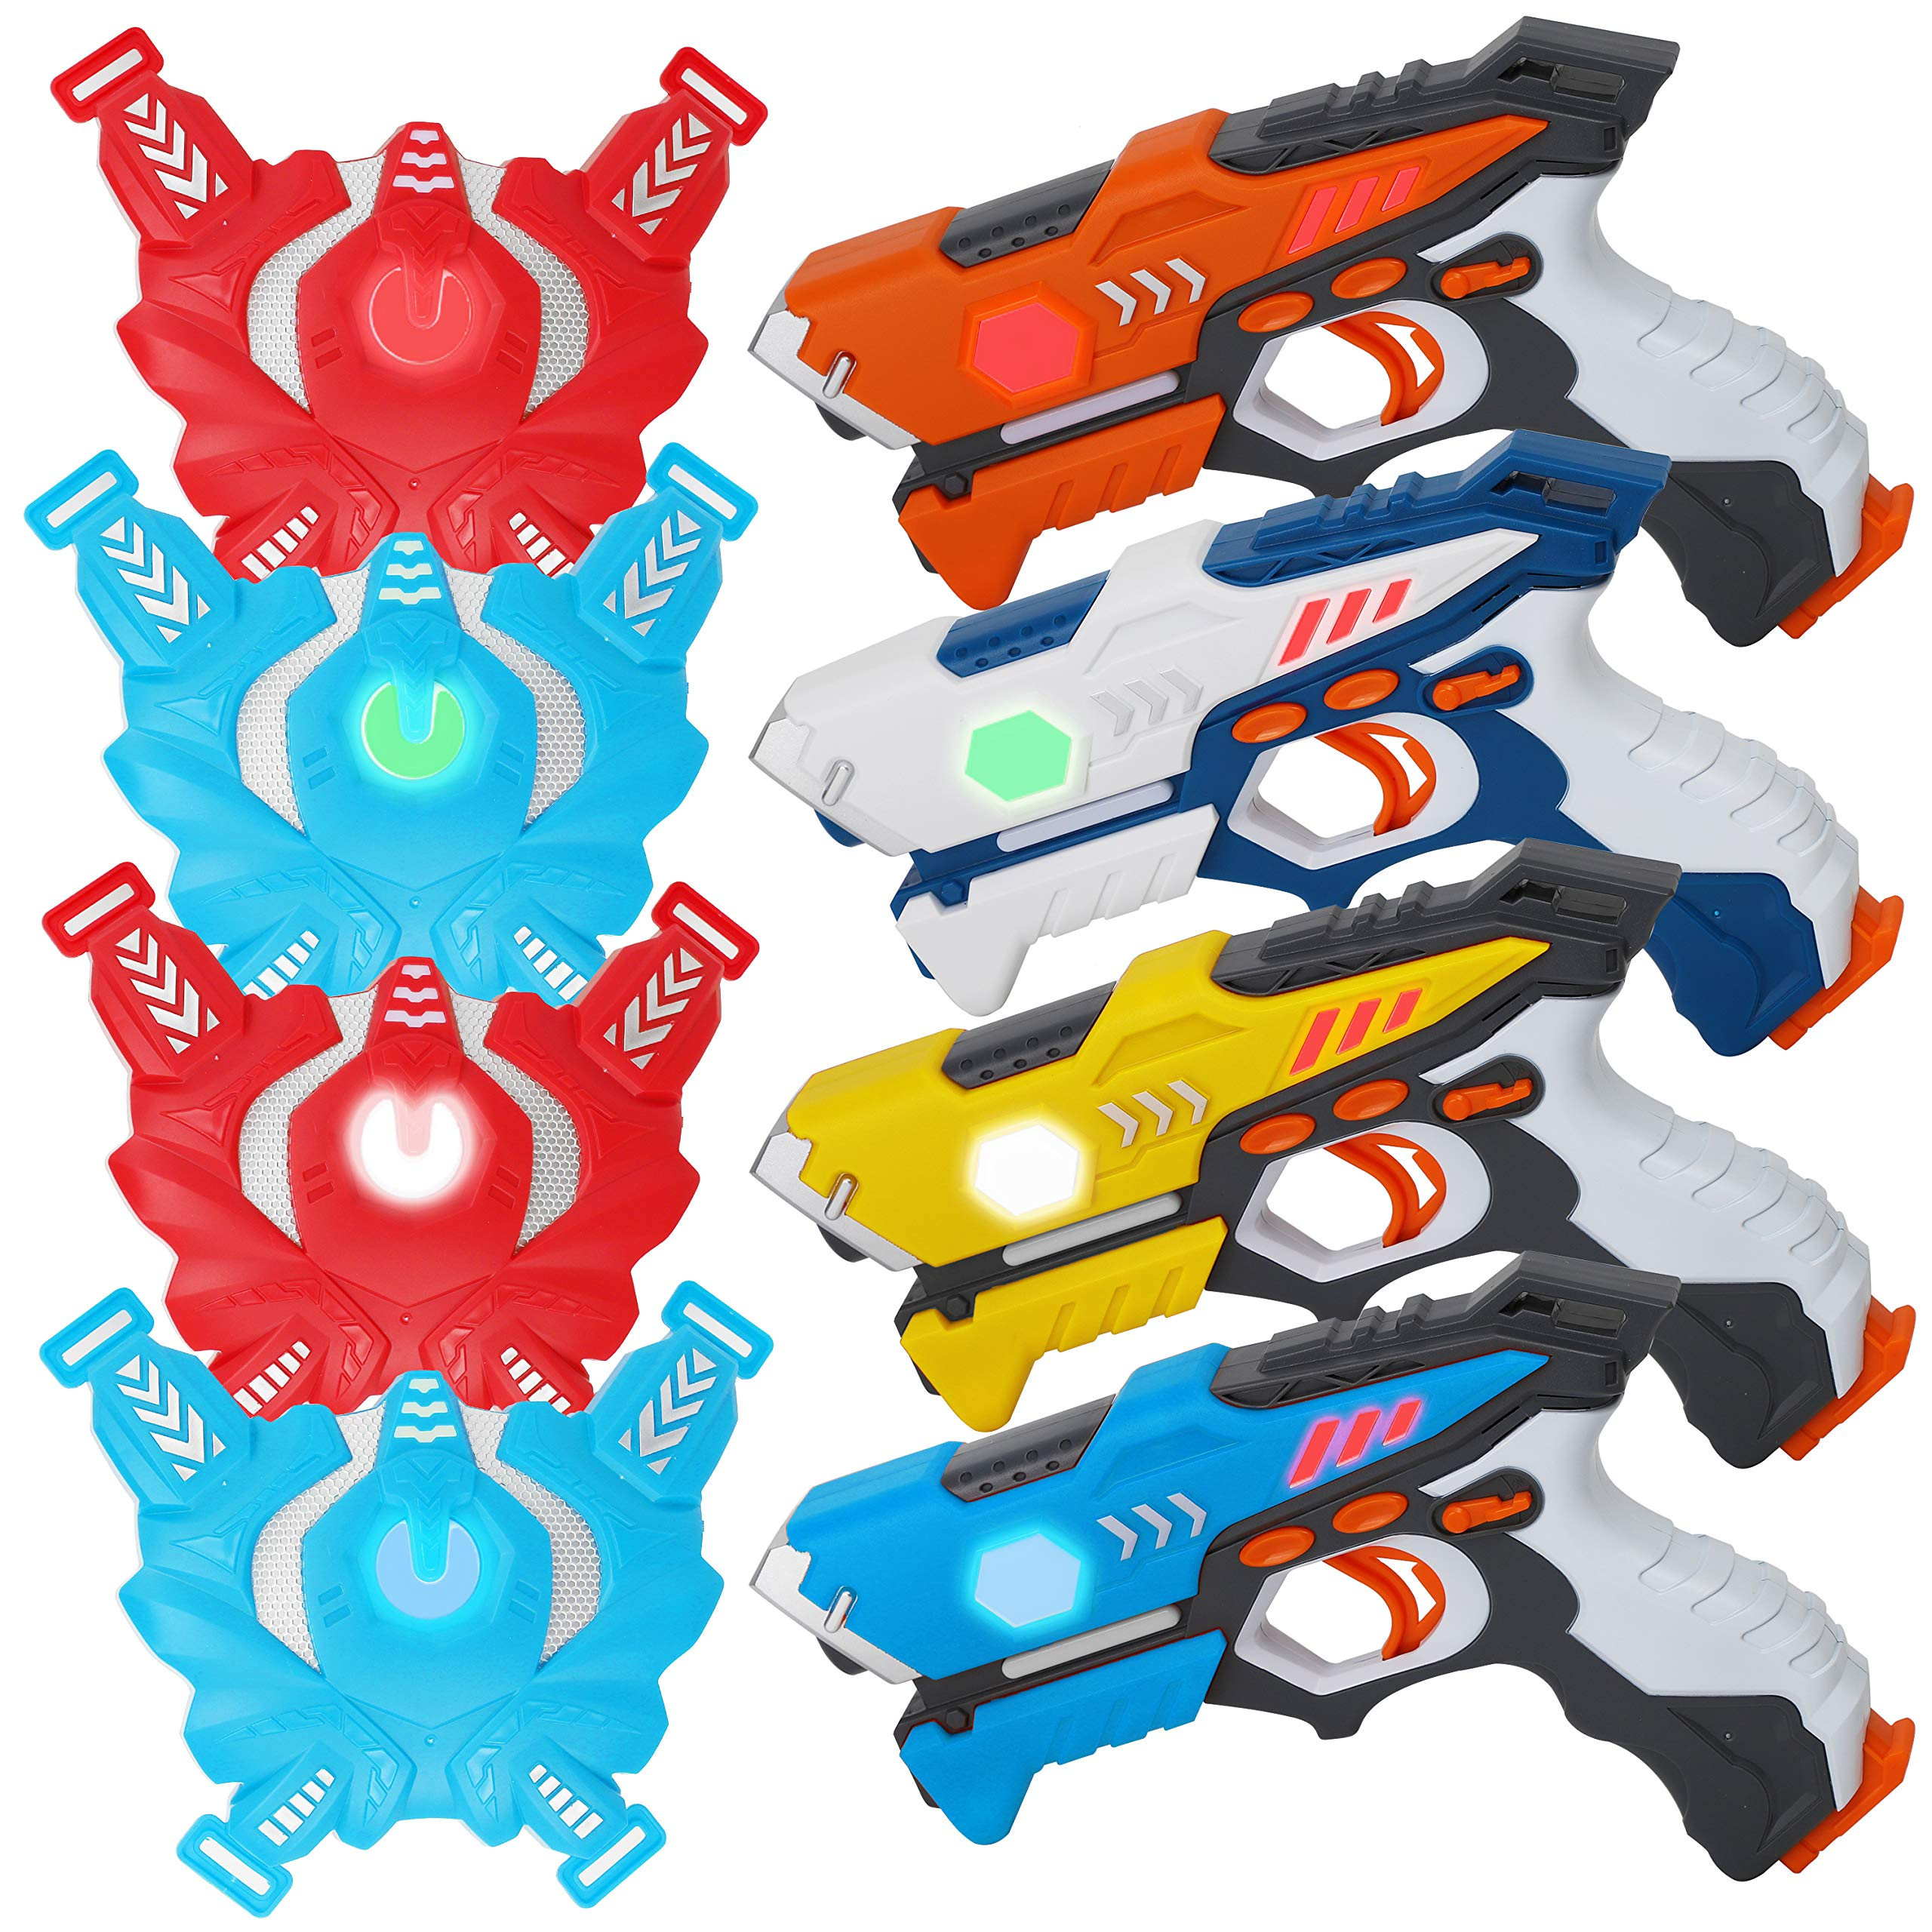 QUQUMA Infrared Laser Tag Set 4 Guns 4 Vests - Indoor Outdoor Laser Gun Kit Toy for Girl & Boy Laser Tag Game Set Best Gift Boys Girls(Laser Guns) by QUQUMA (Image #1)